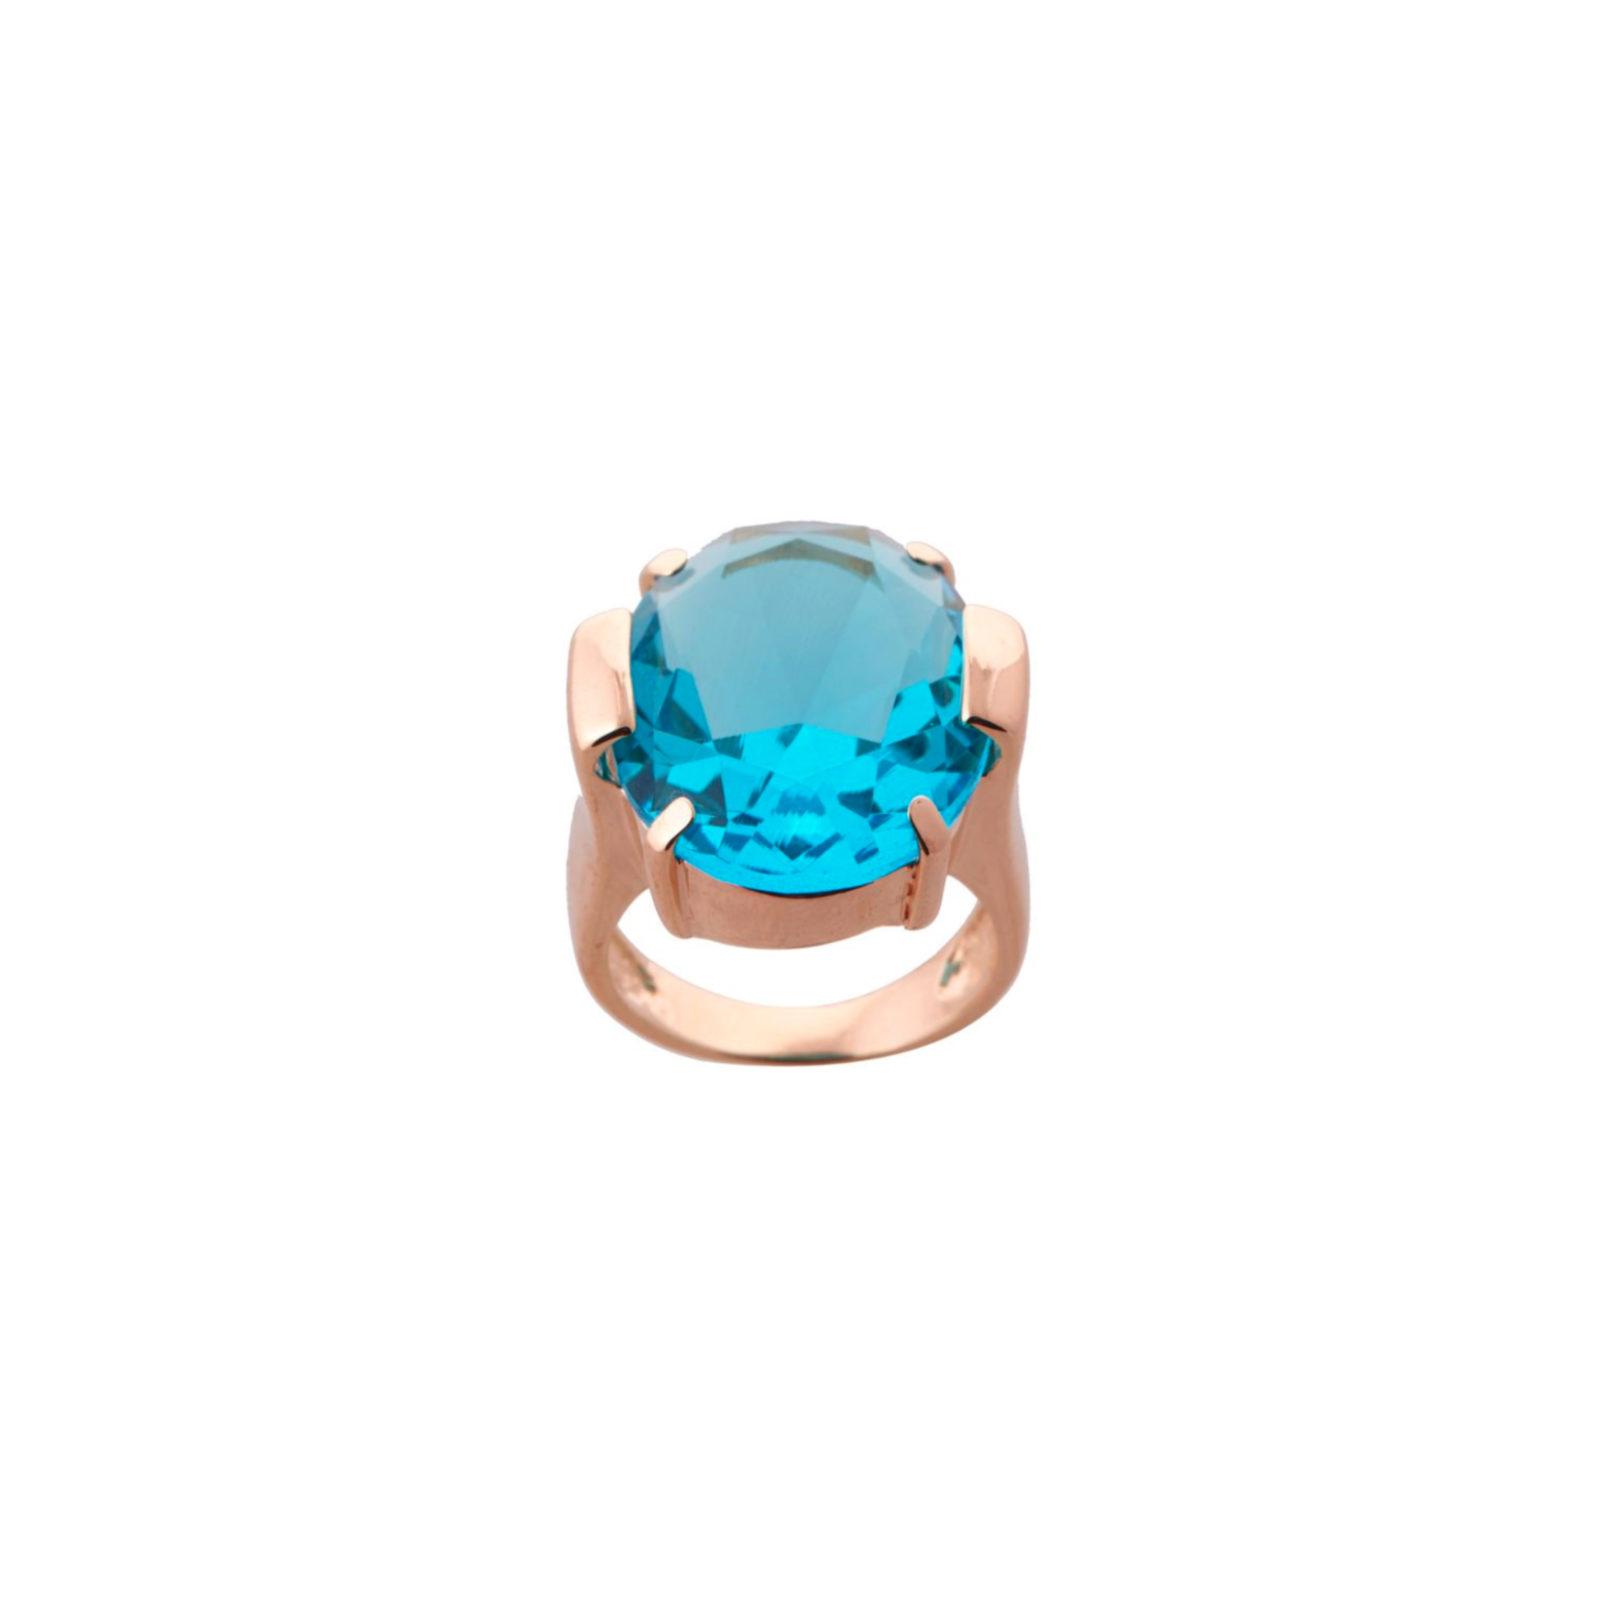 Anel Cristal Azul Oval Banho Ouro   Lanarée Acessórios